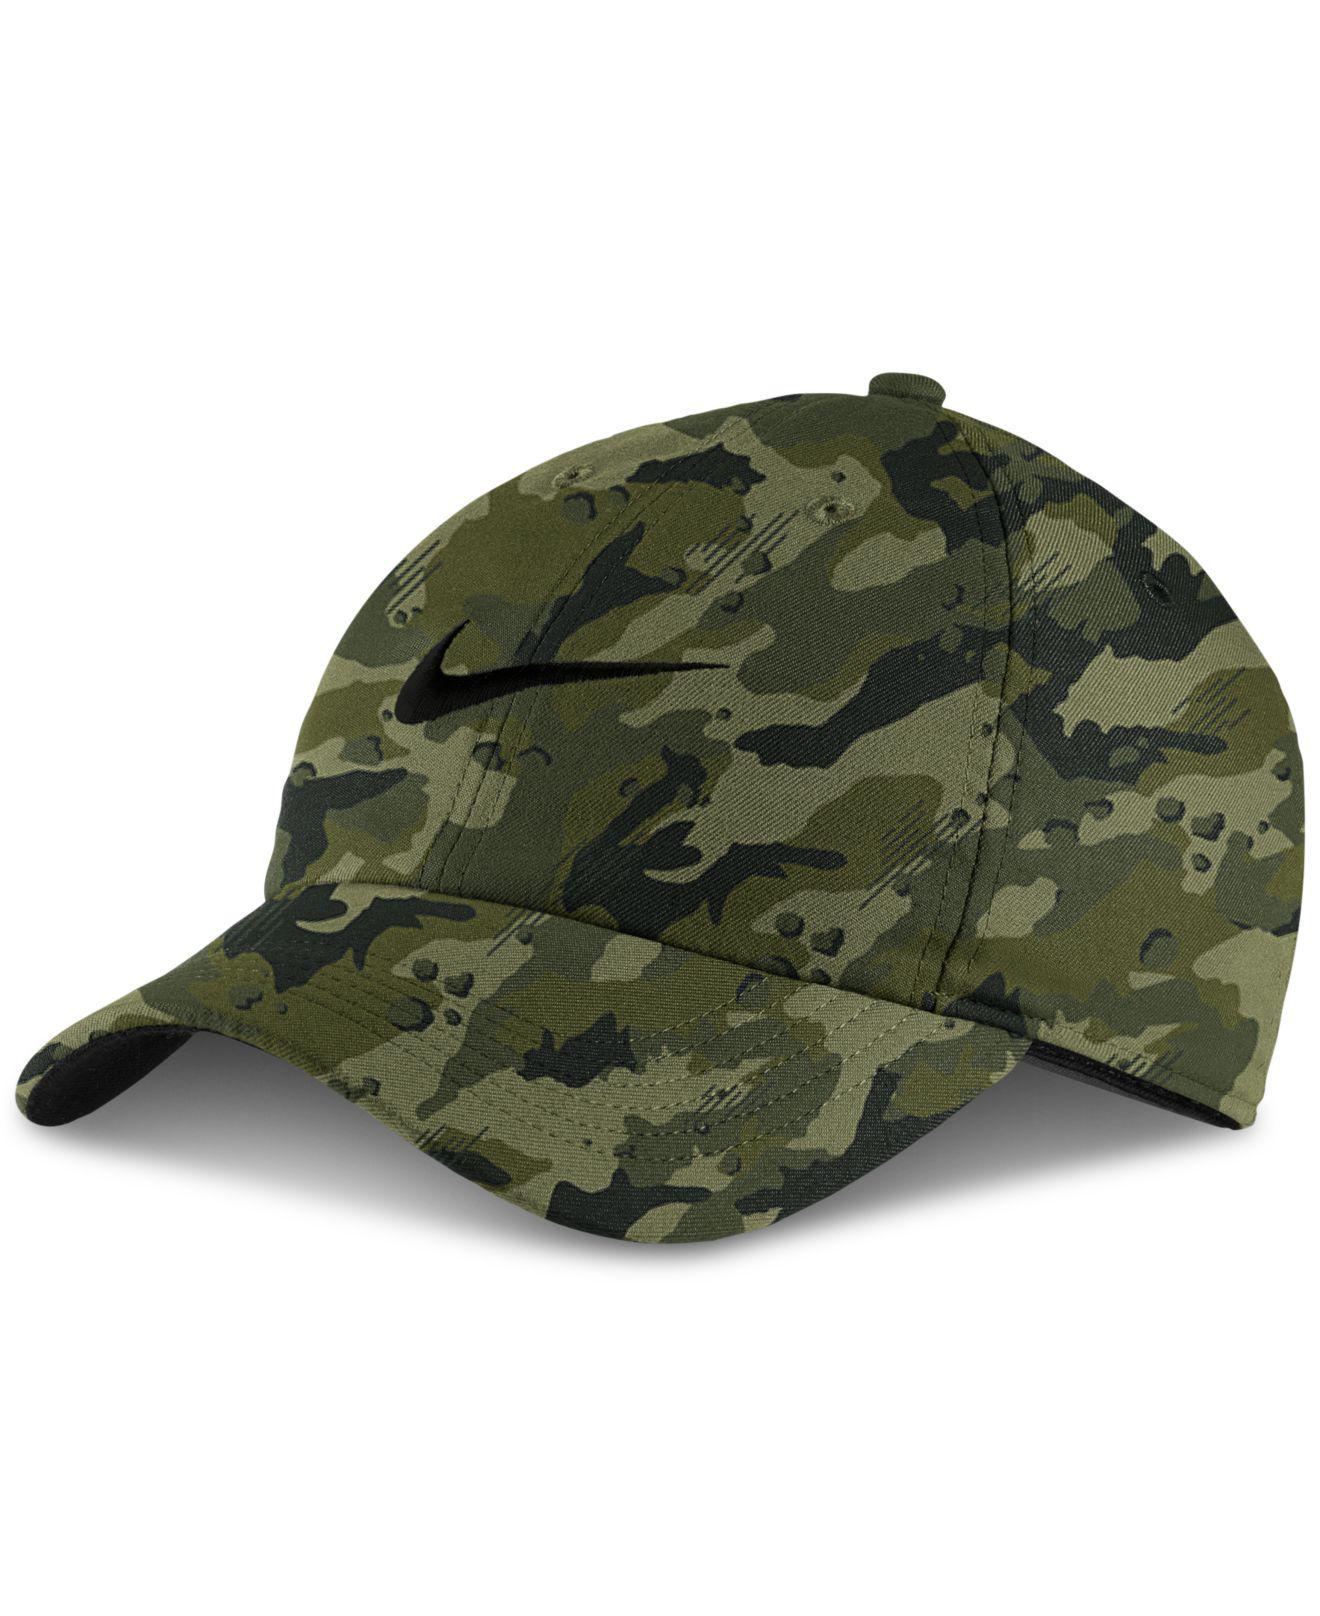 Lyst - Nike Aerobill Dri-fit Camo-print Cap in Green for Men 85b5ad9973a